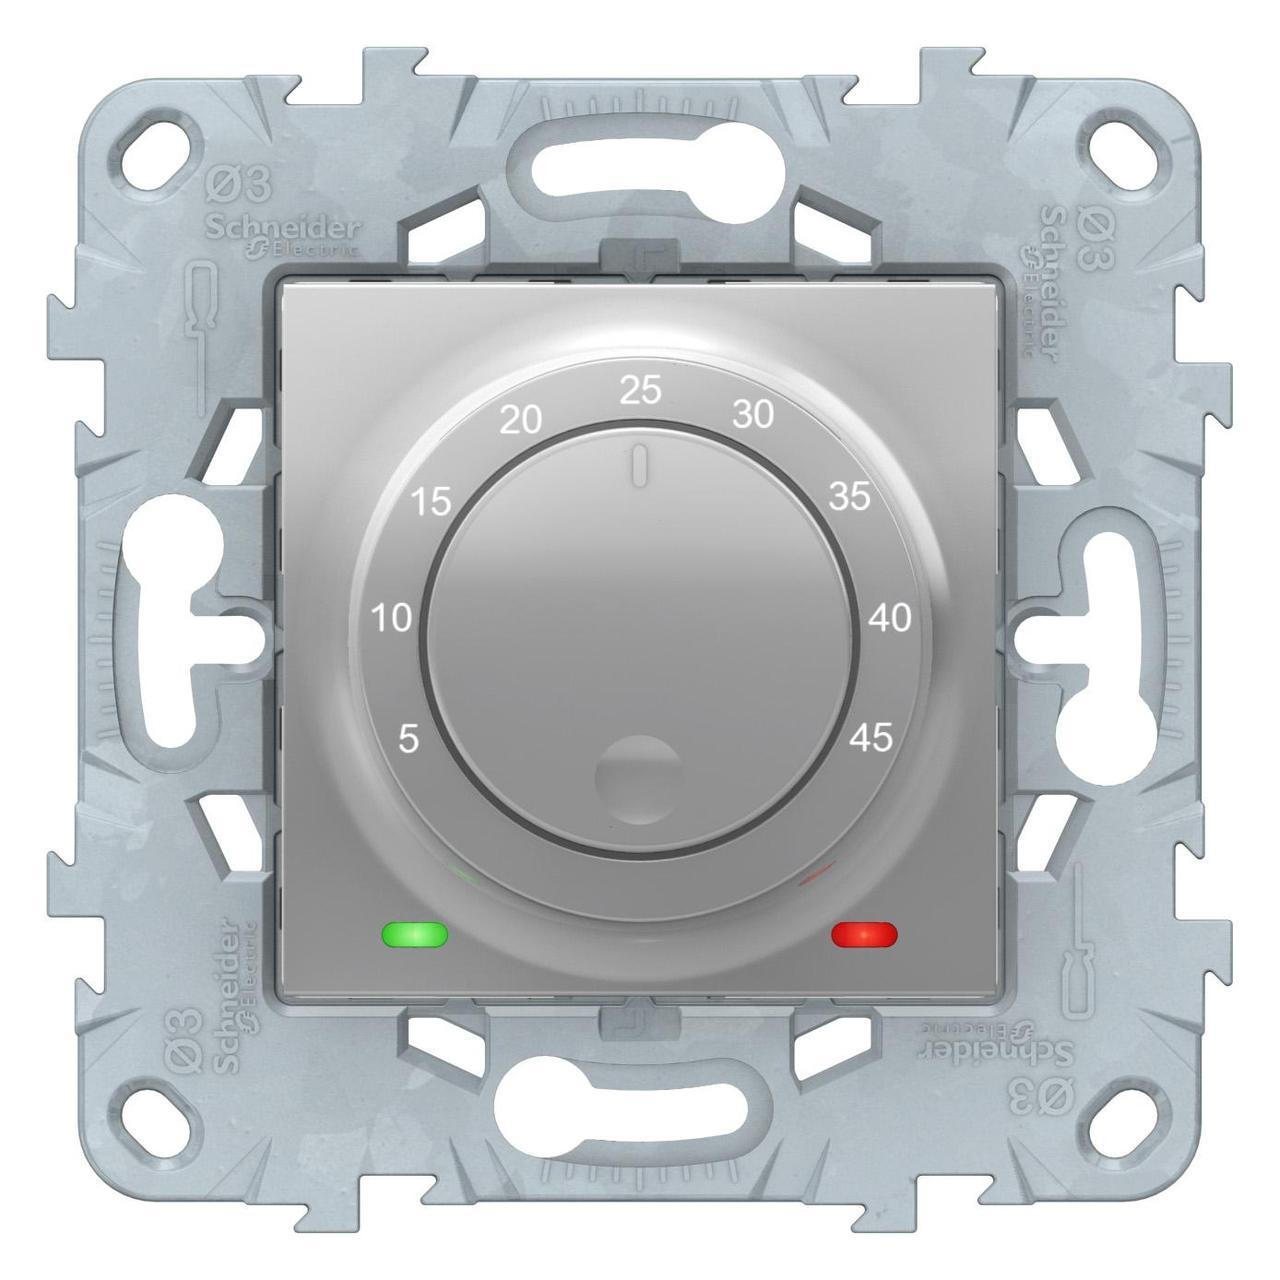 Терморегулятор для теплого пола , Алюминий, серия Unica New, Schneider Electric